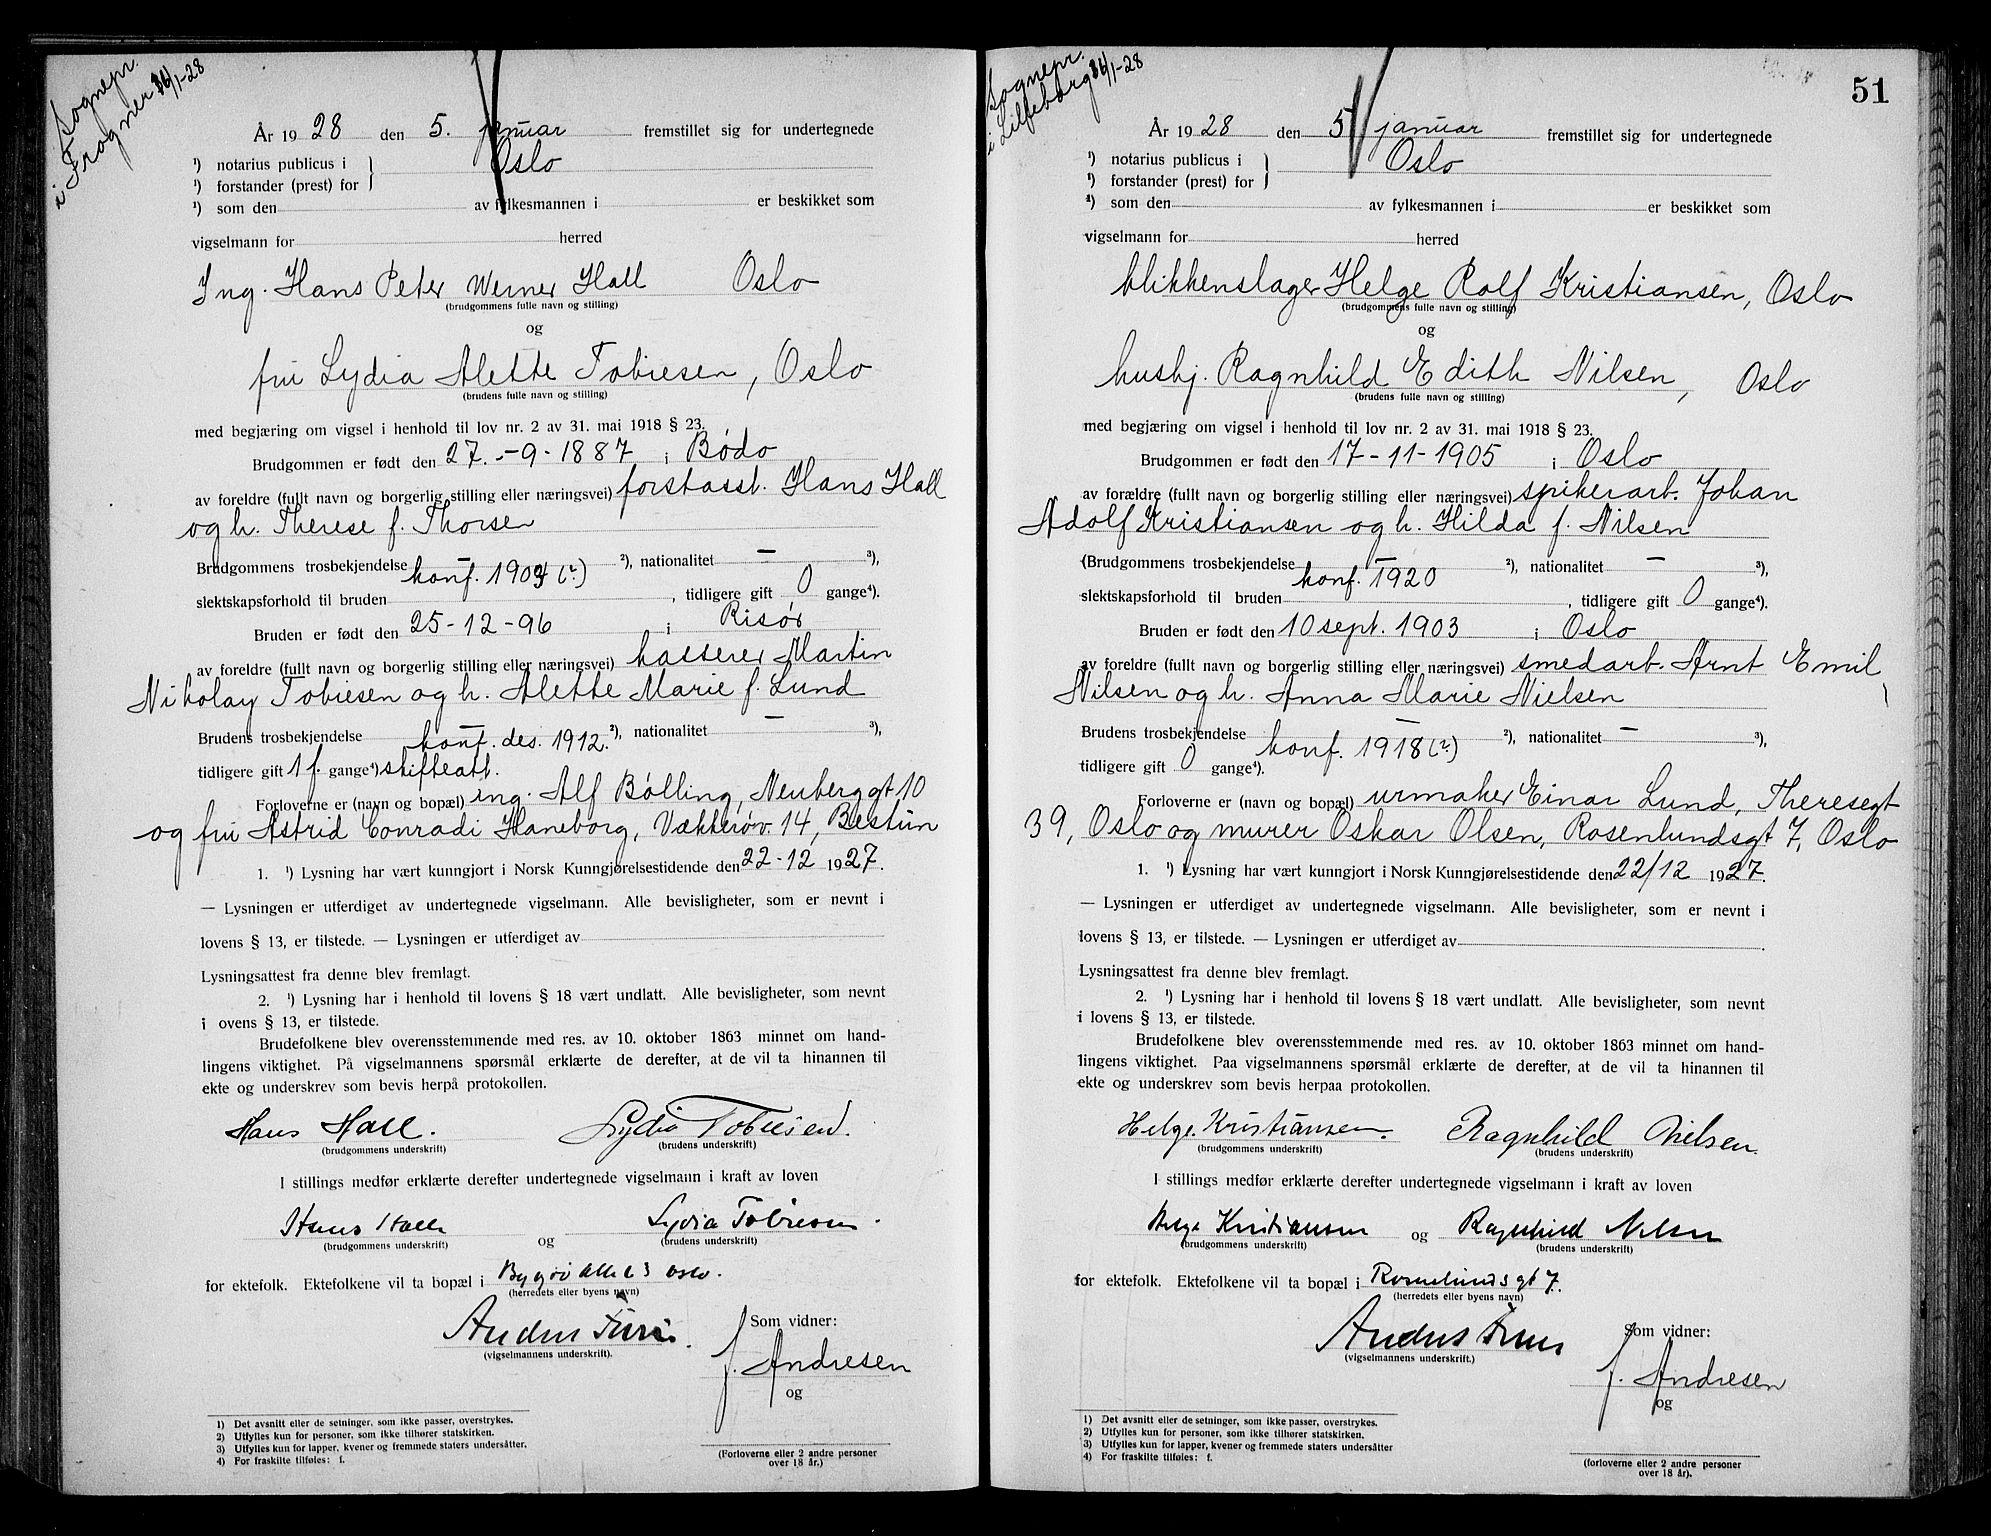 SAO, Oslo byfogd avd. I, L/Lb/Lbb/L0018: Notarialprotokoll, rekke II: Vigsler, 1926-1928, s. 50b-51a